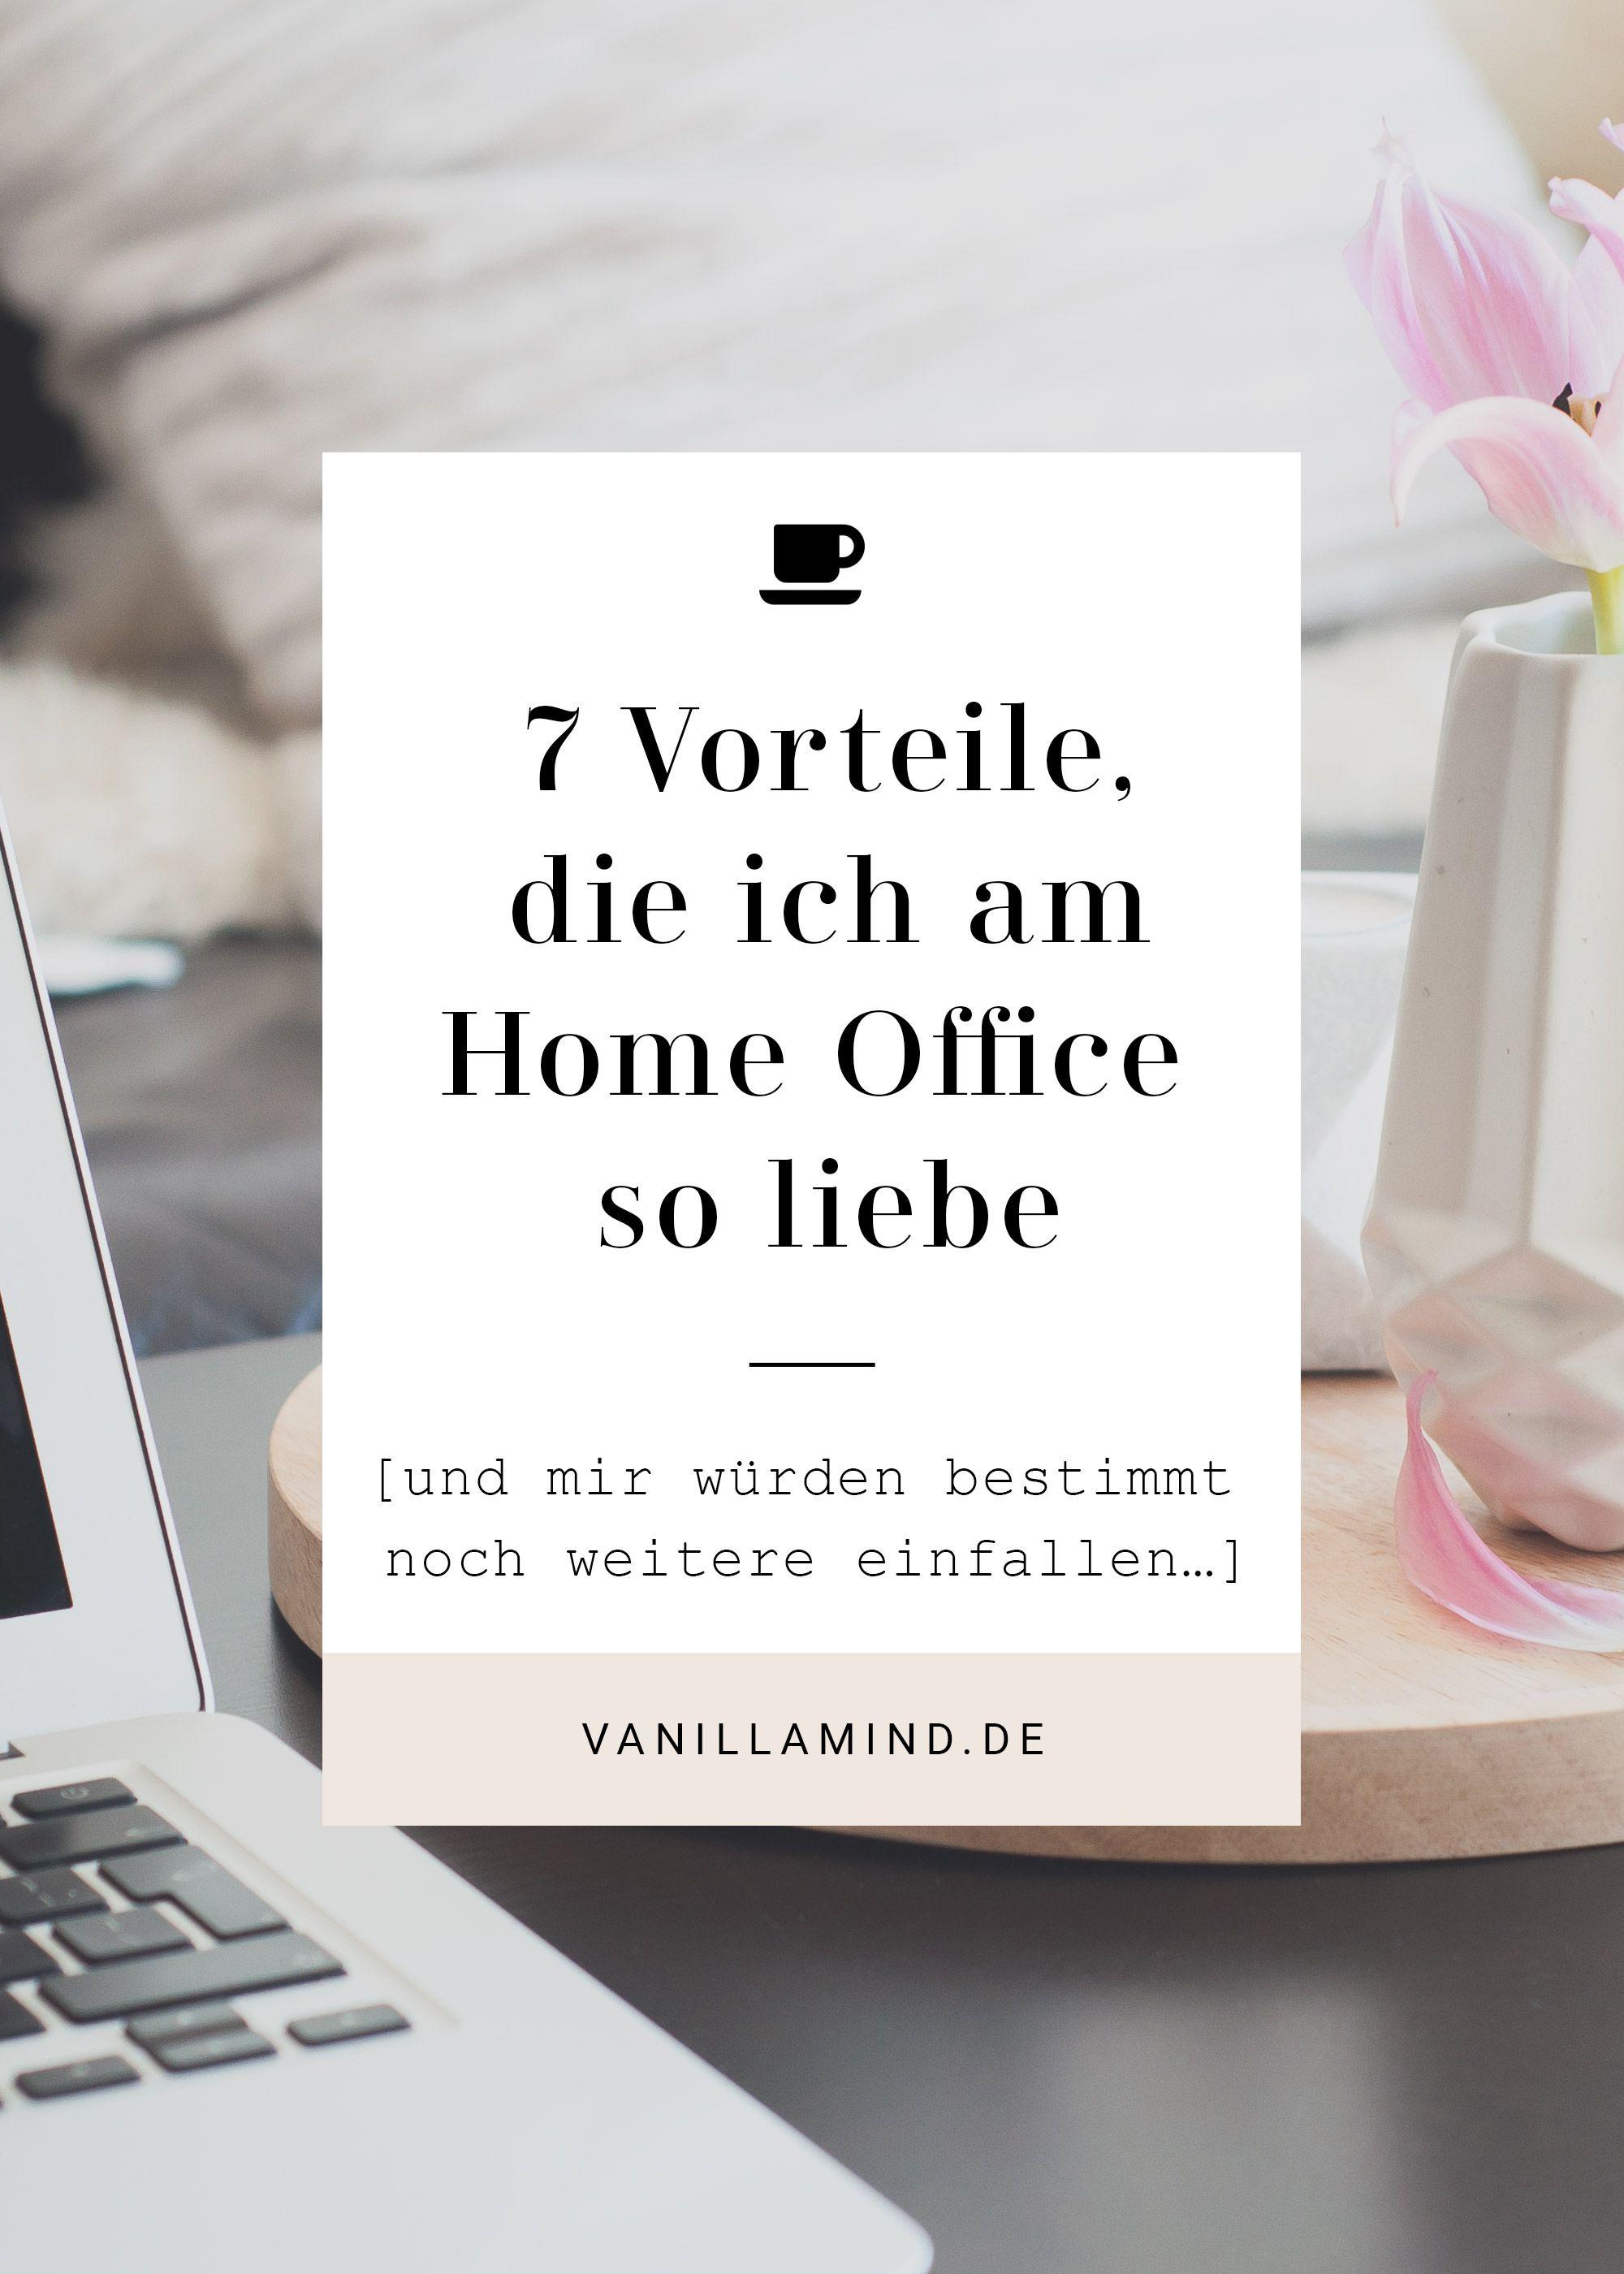 Home Office vs. Büro Arbeitsplatz   Seit ich meinen Job gekündigt ...